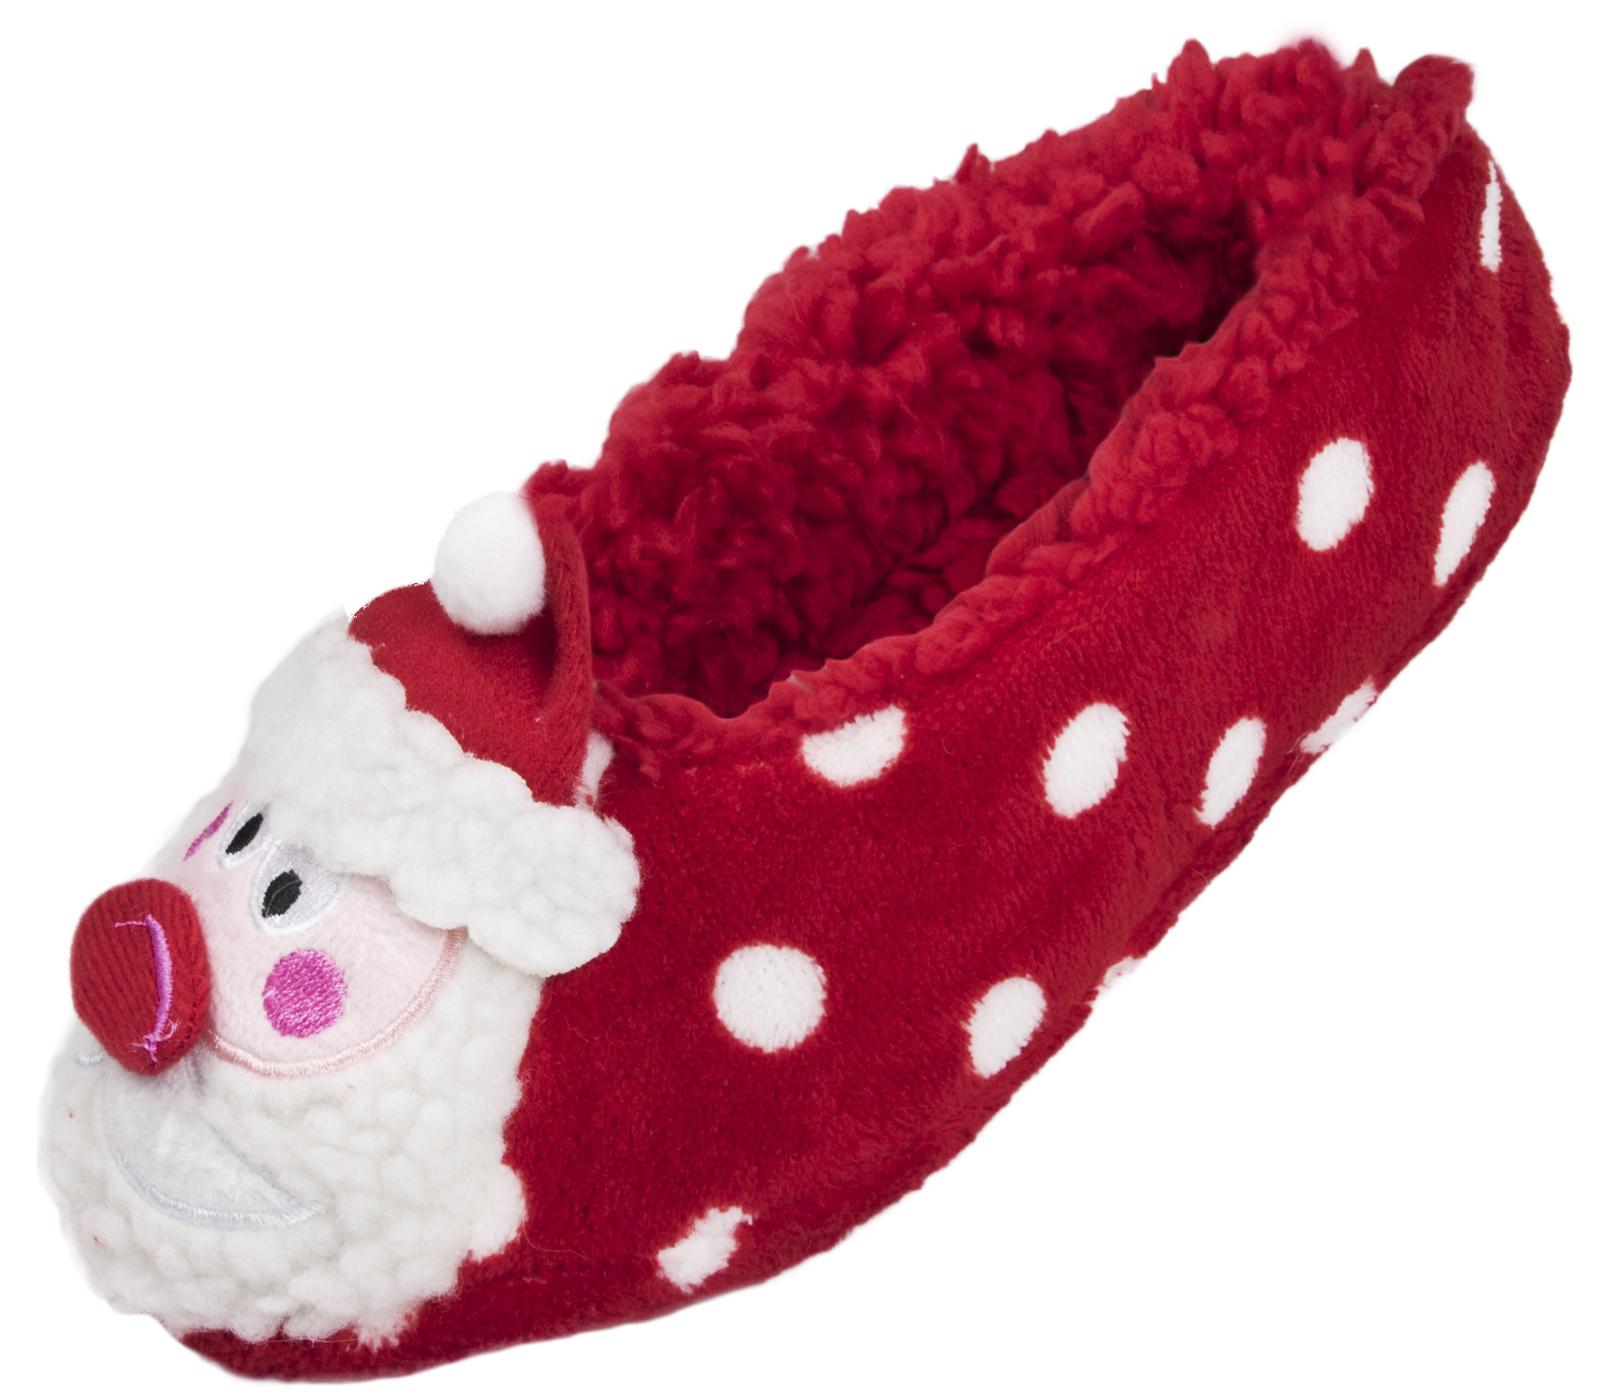 La s Christmas Slipper Socks 3D Xmas Footlets Character Ballet